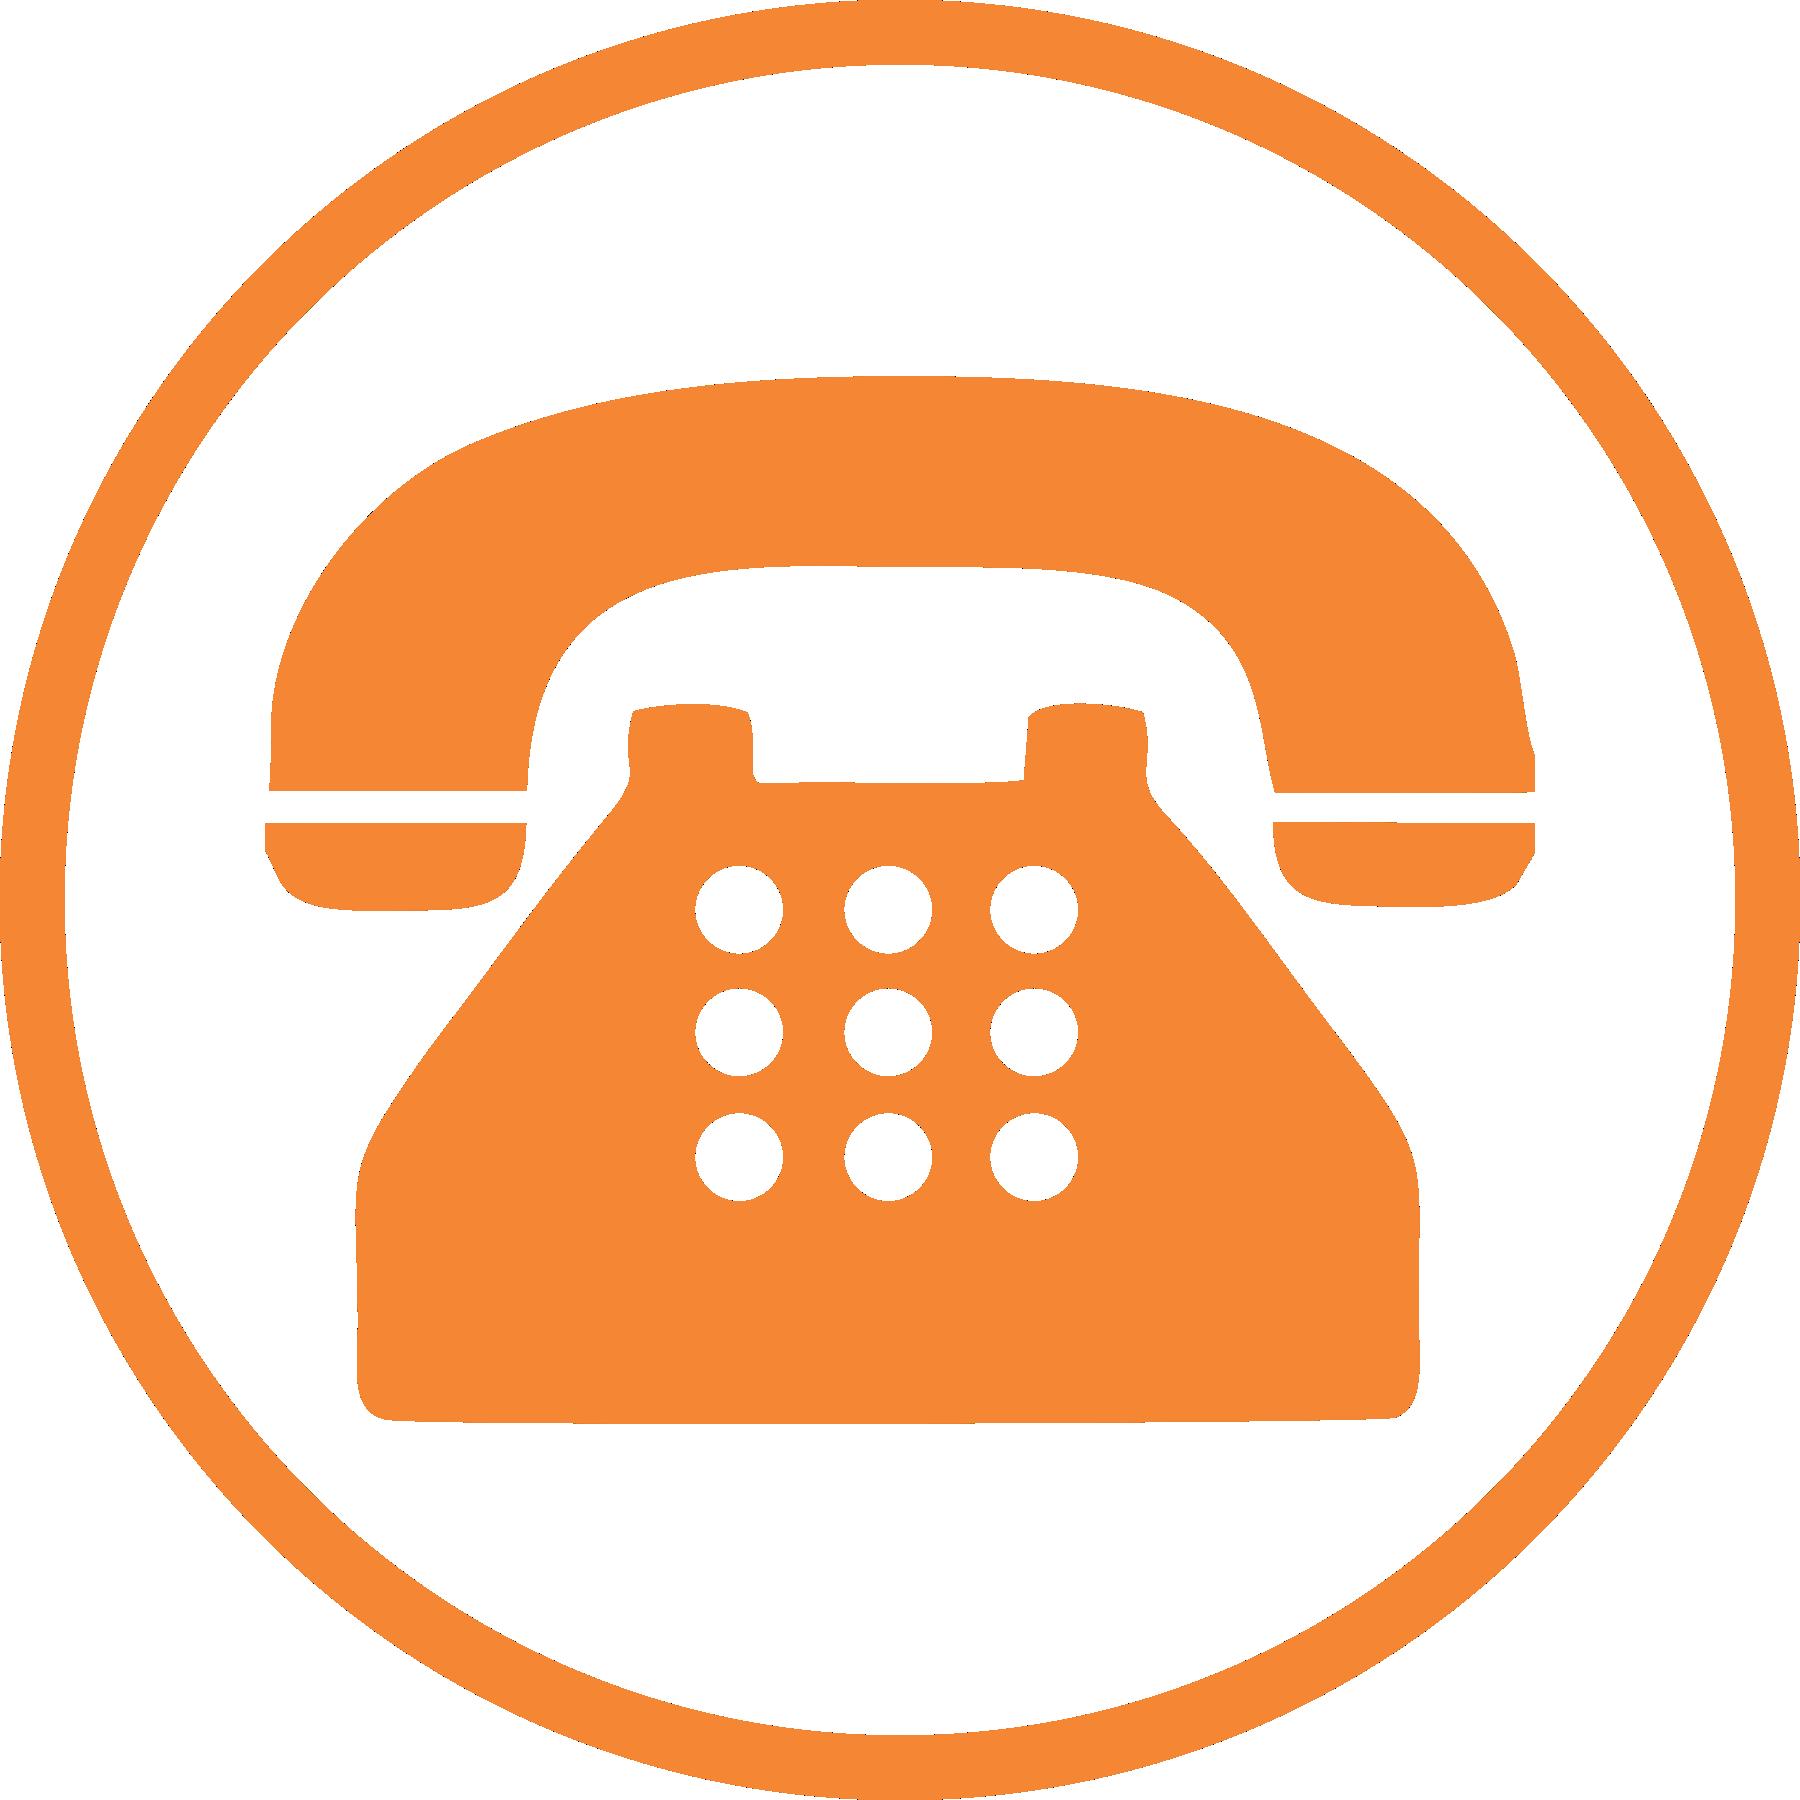 Telefone para contato carreira fashion Billboards